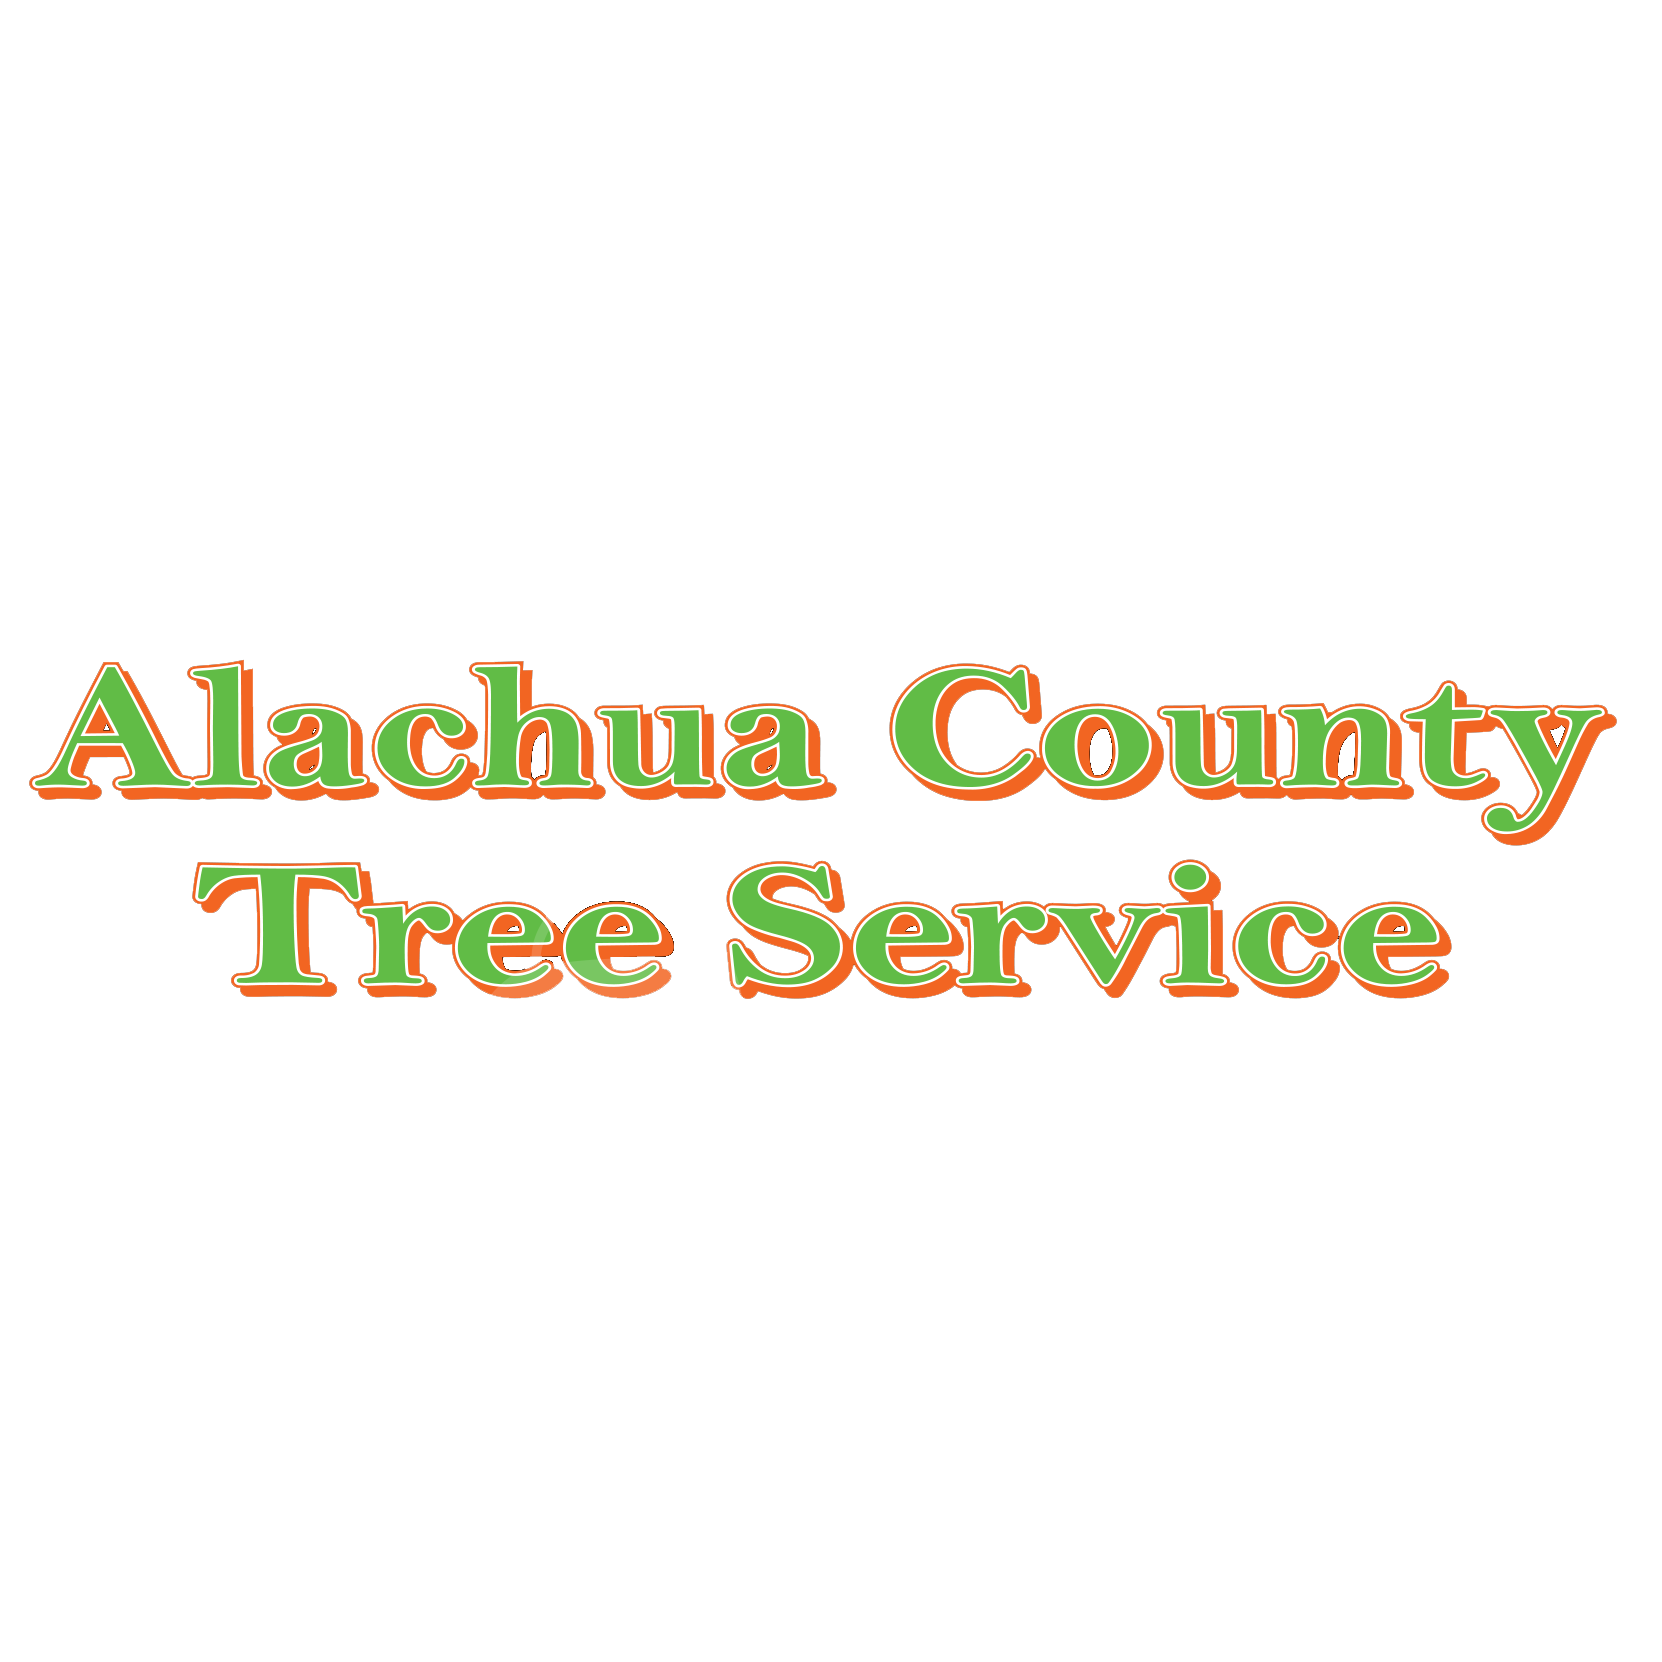 Alachua County Tree Service